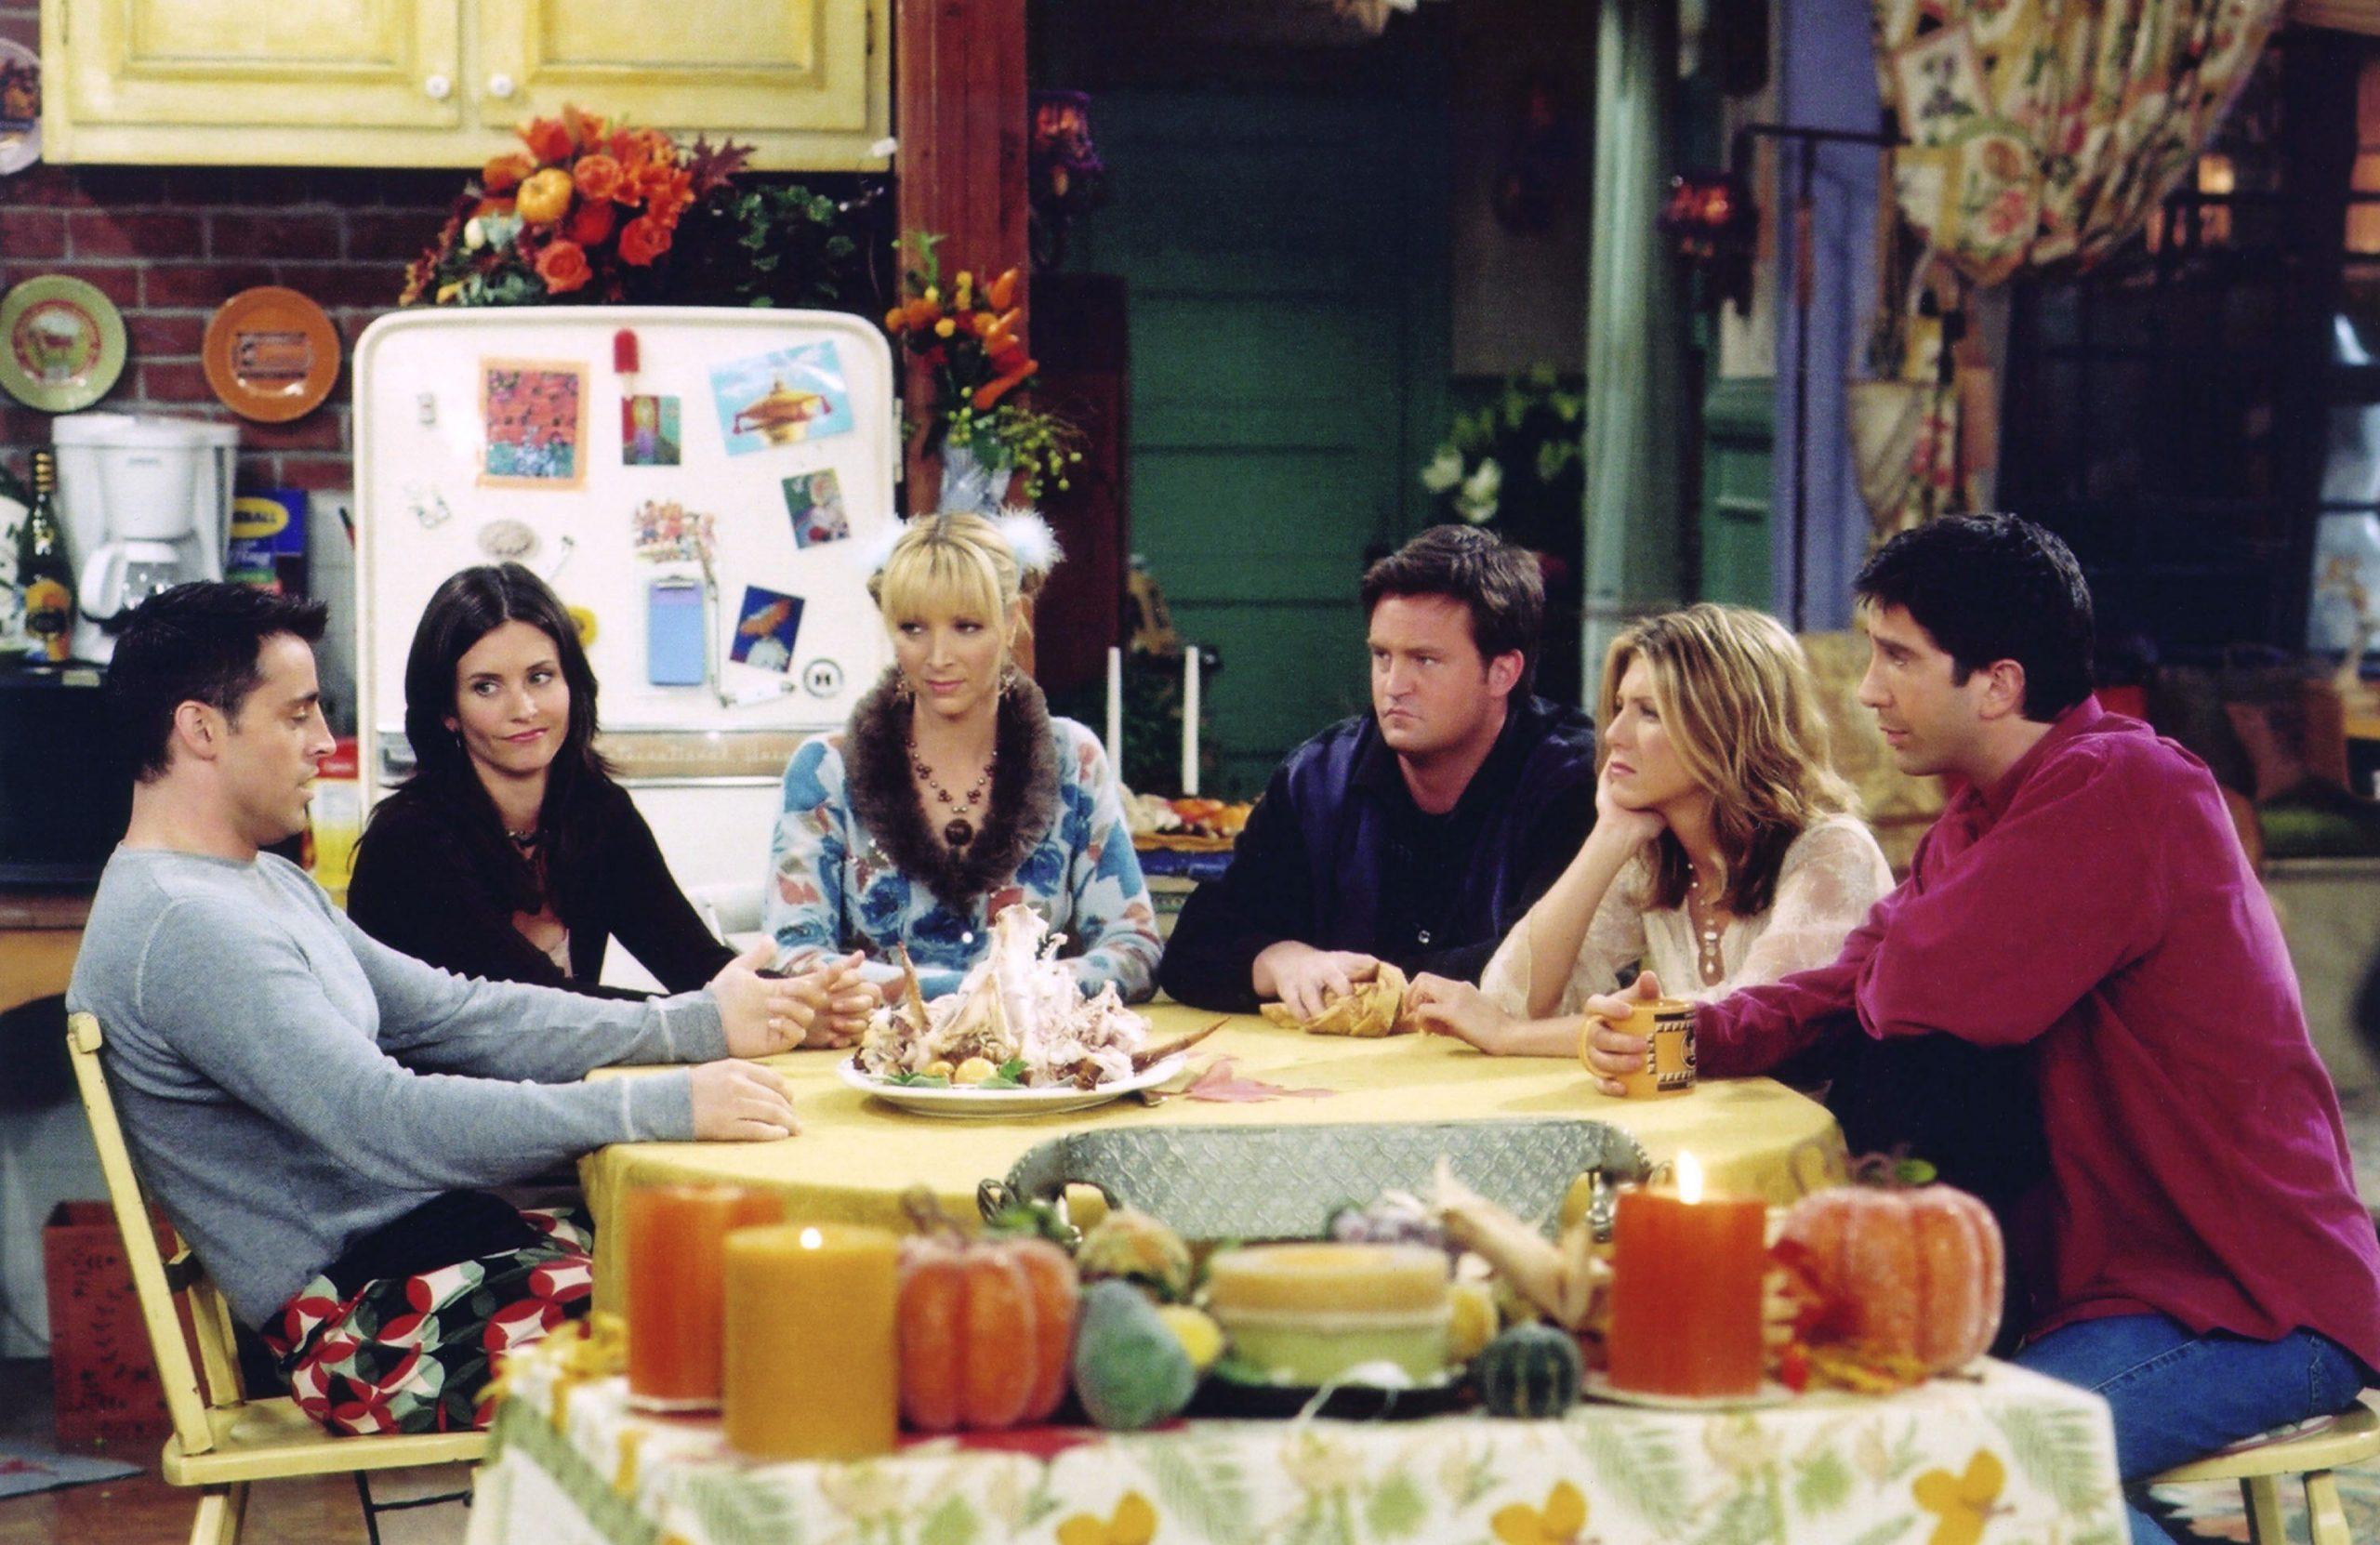 8 Things That Make No Sense About 'Friends'